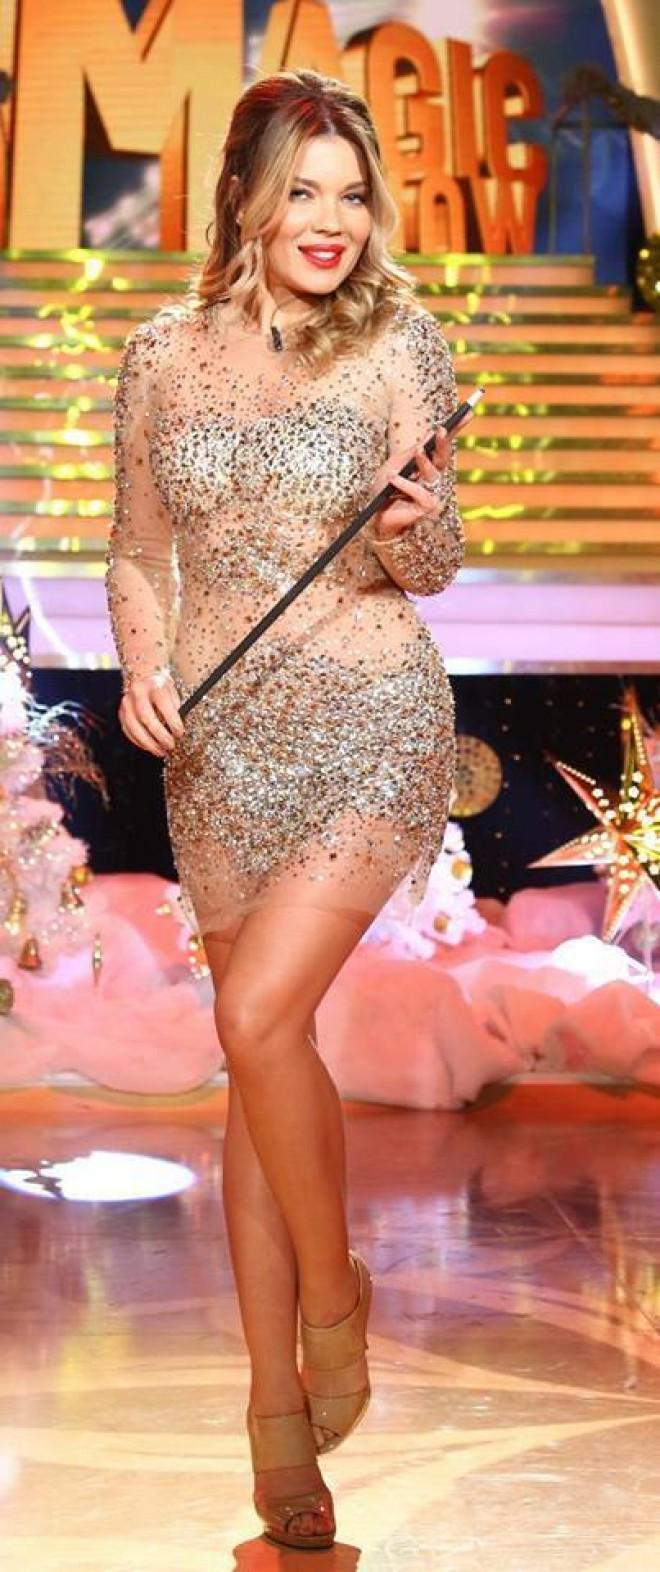 Gina Pistol, imaginile care demonstreaza ca este femeia cu corp perfect. Cum arata in mijlocul junglei, cand este imbracata in costum de baie